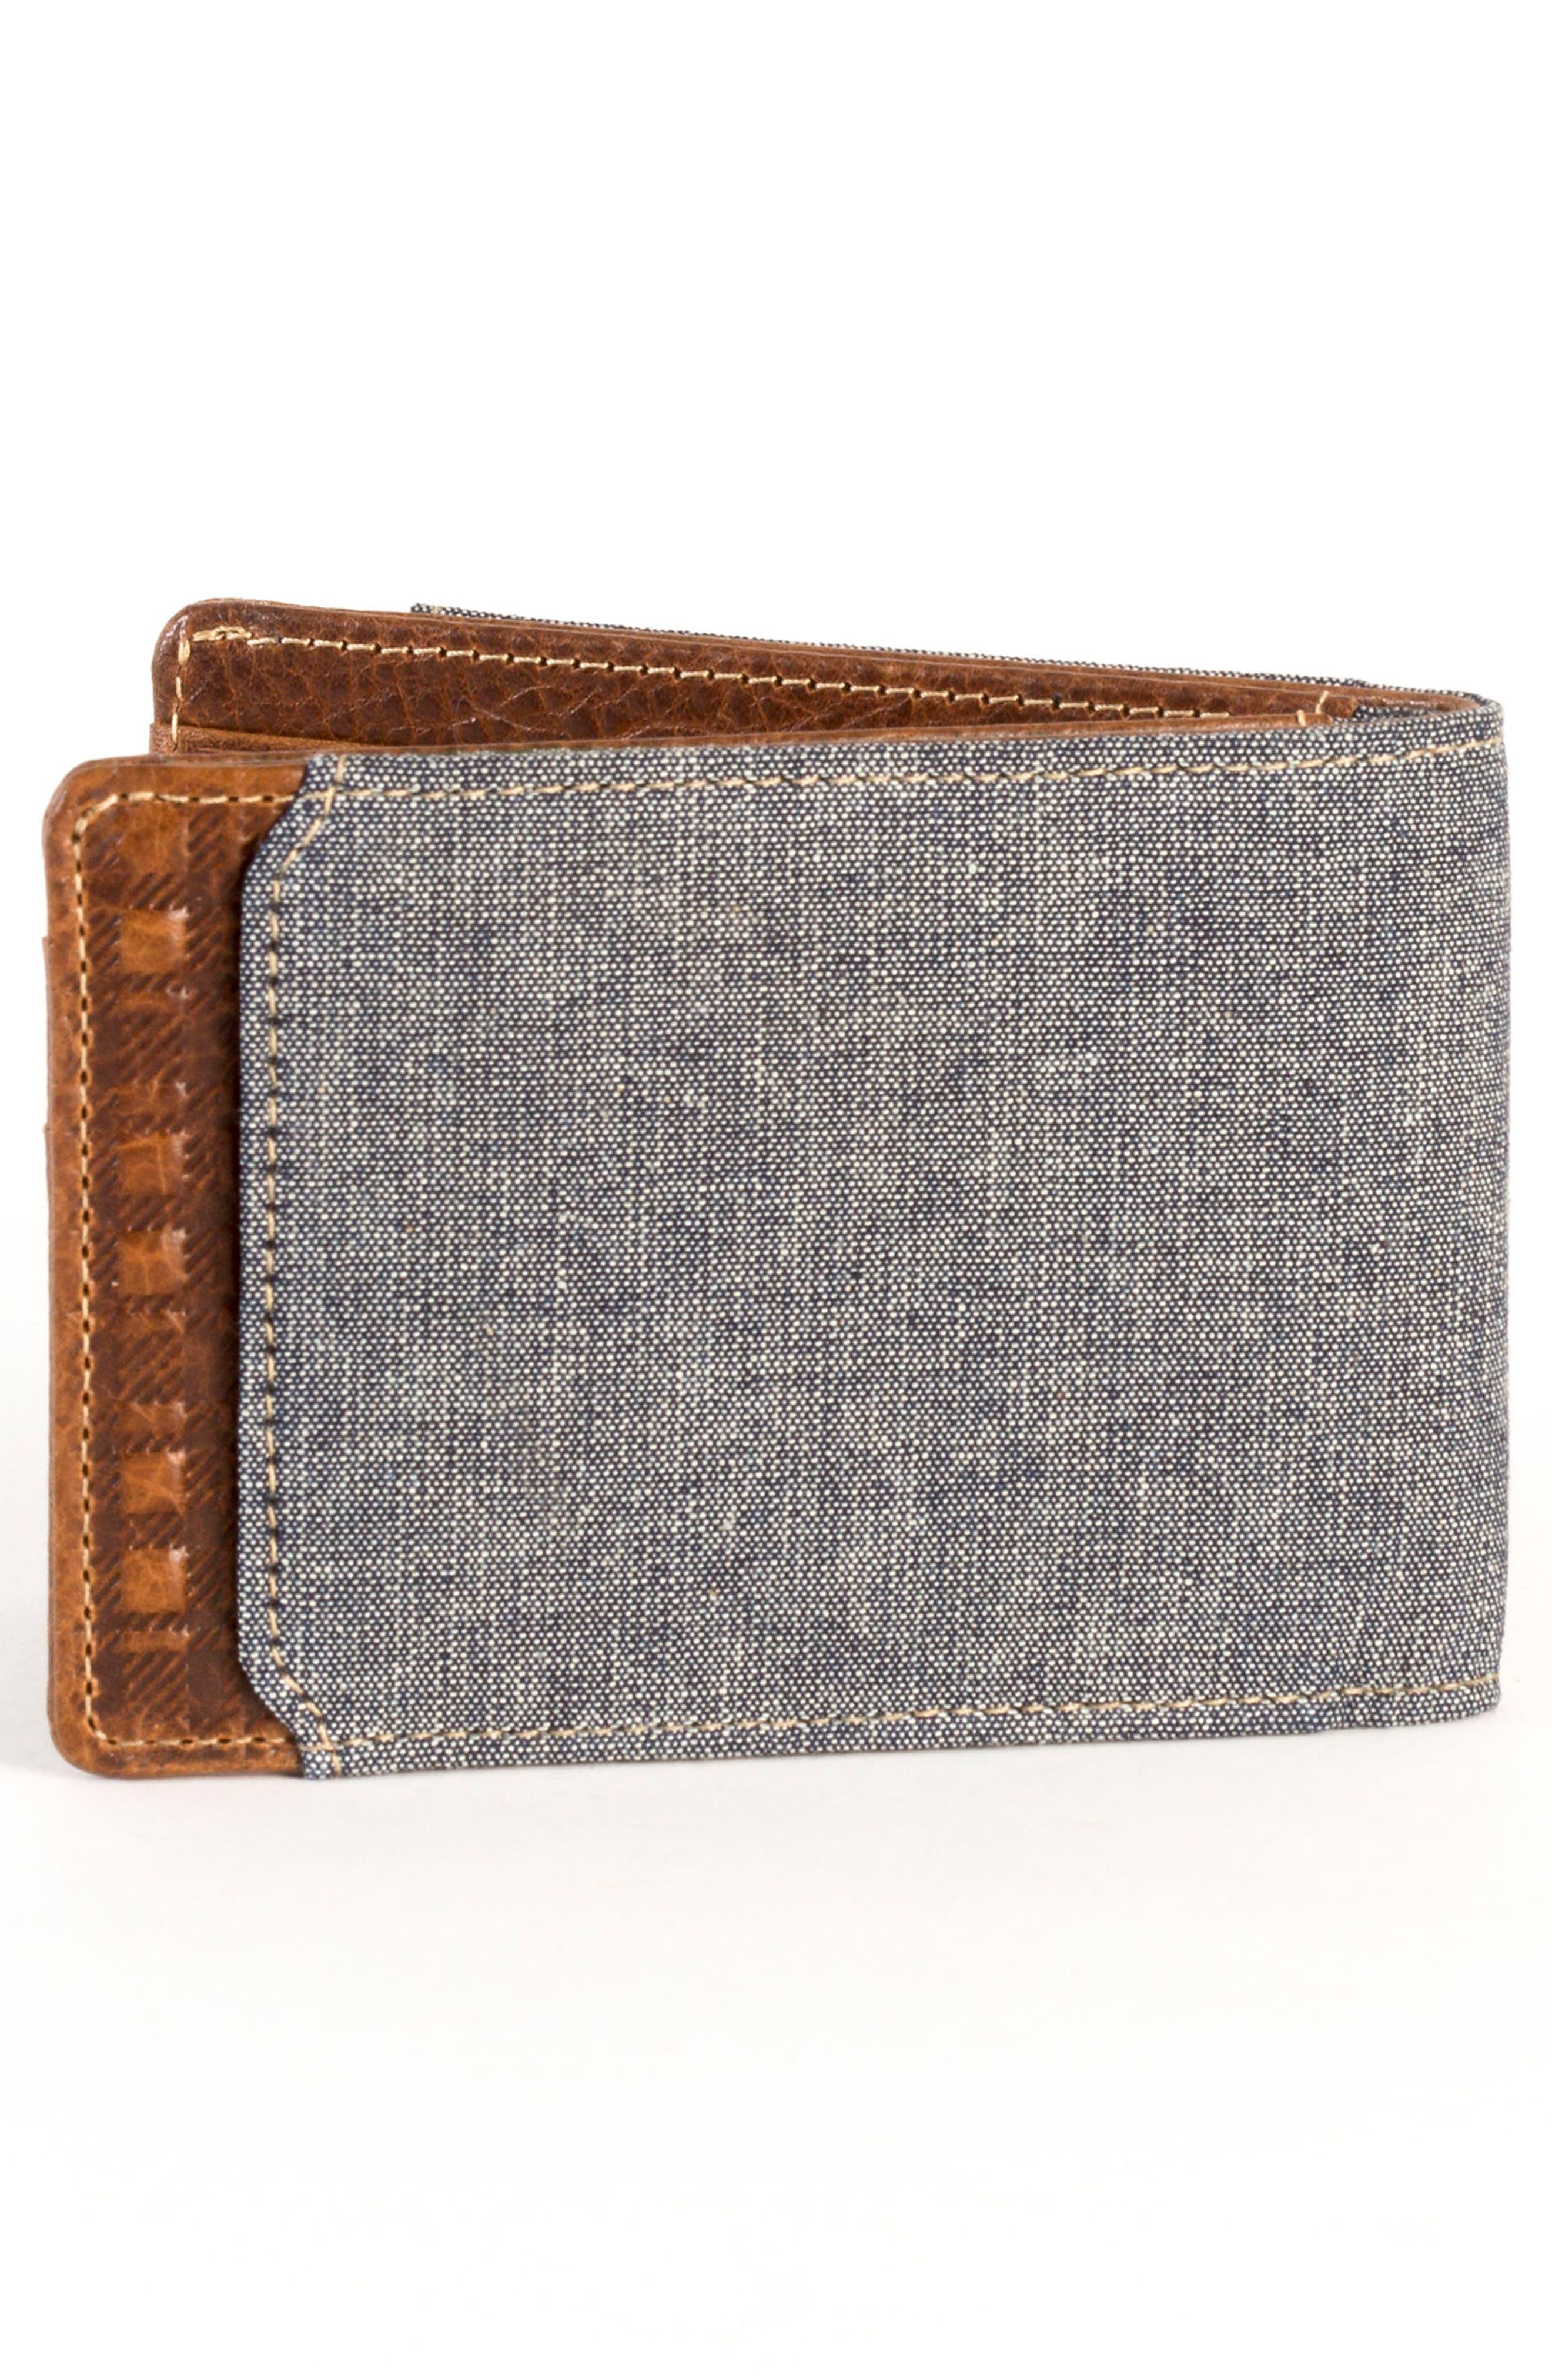 Caleb LTE Wallet,                             Alternate thumbnail 3, color,                             Chestnut